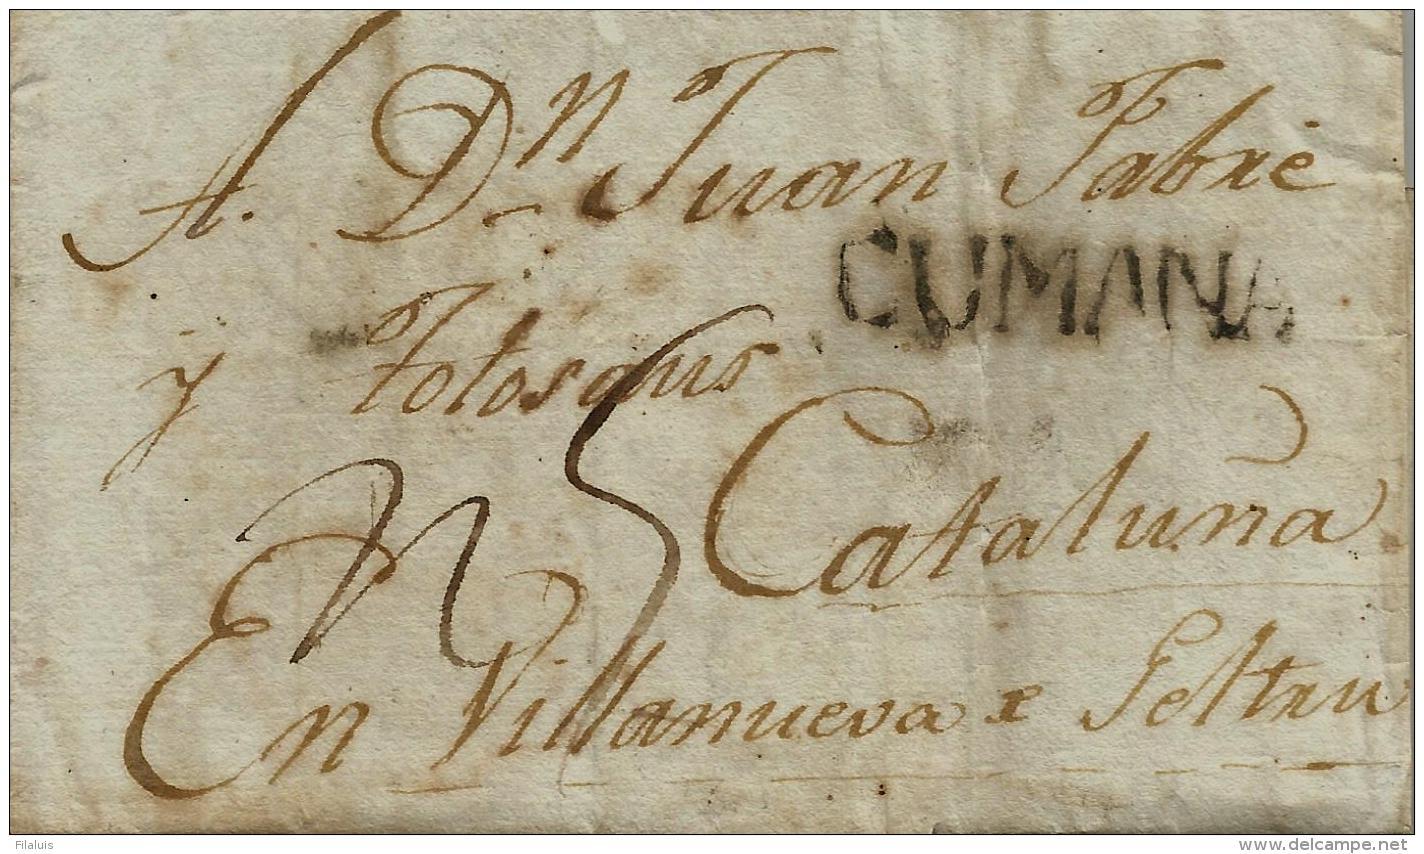 02261 Periodo Colonial Prefilatelia 1809 Carta Con Marca CUMANA / Venezuela A VilLanova I Geltru. - España